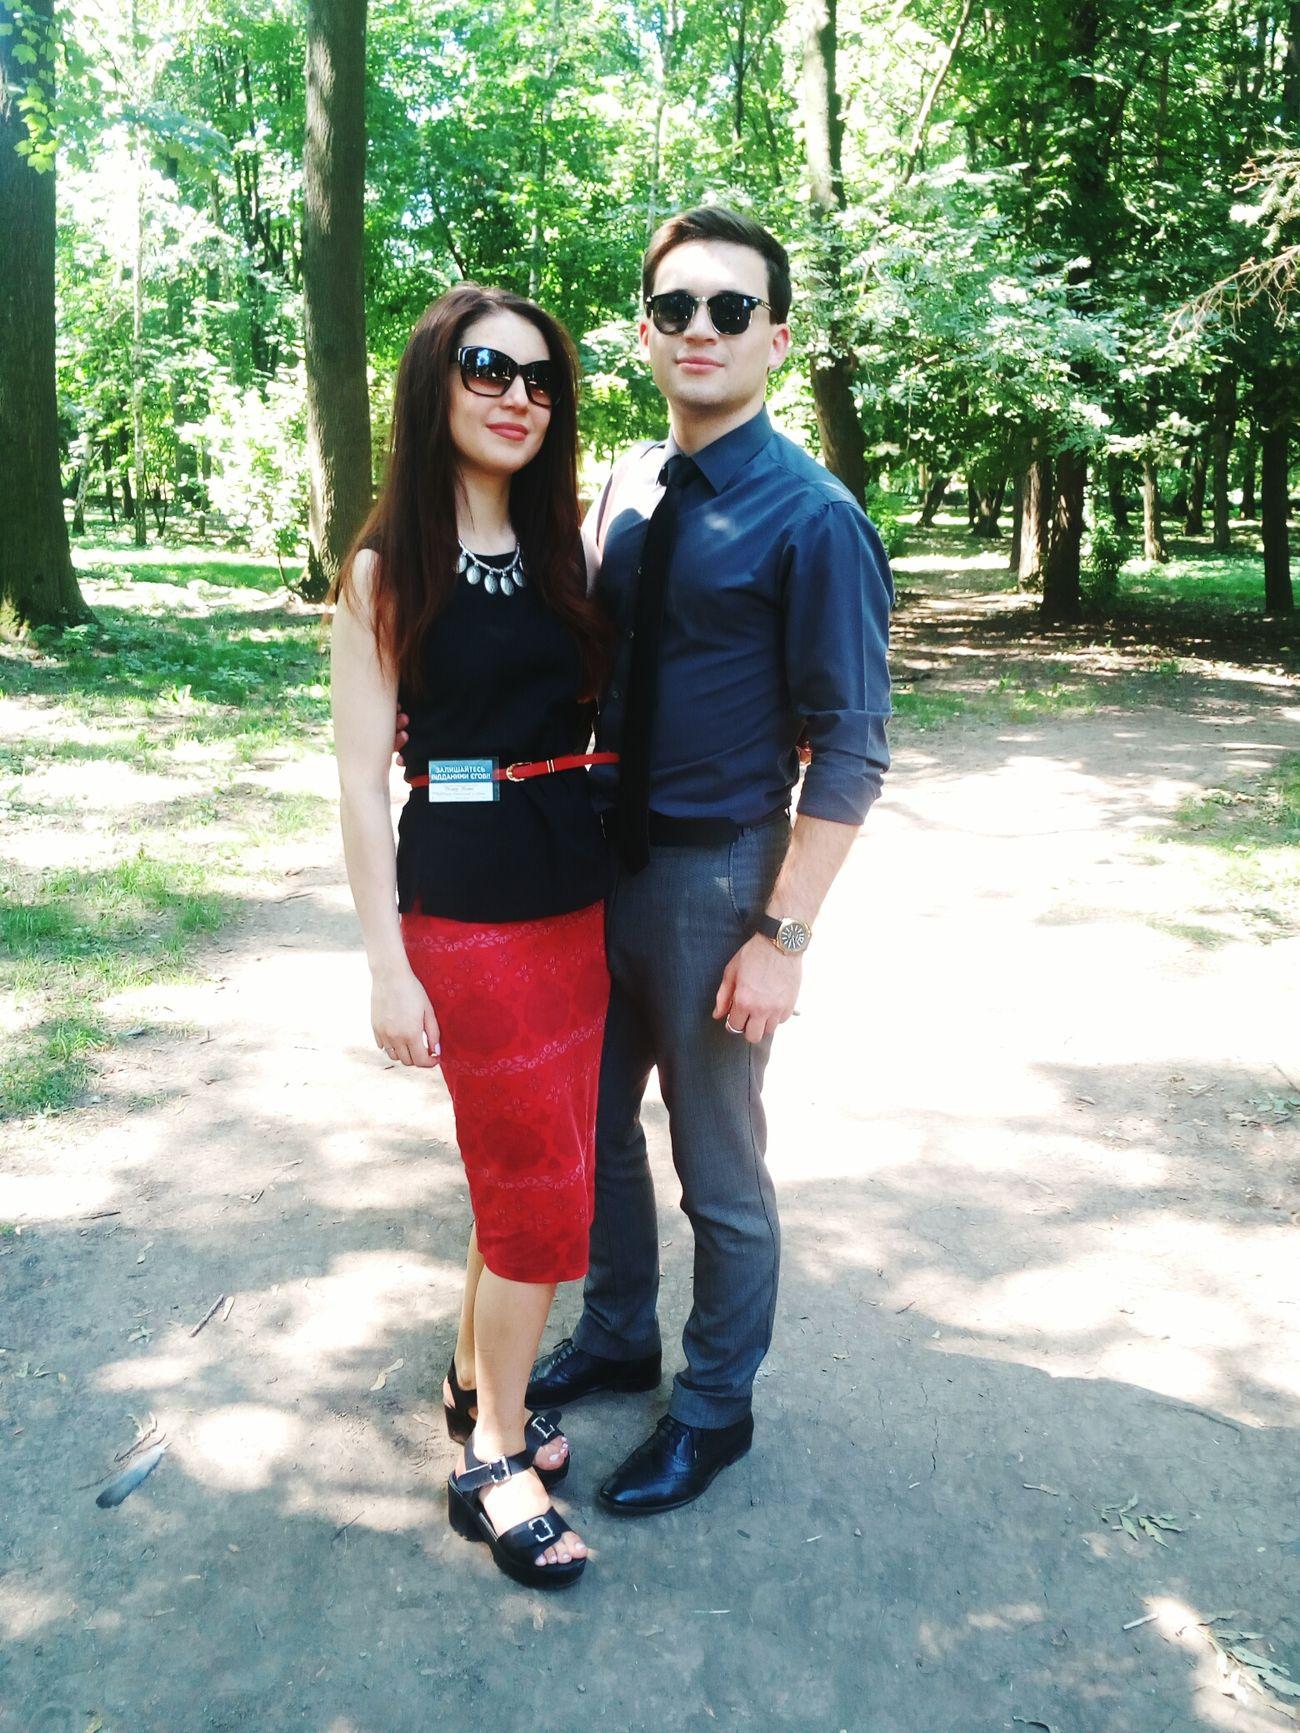 I And My Love My Love Jw Jw Congress Chernivtsi  Best Day Smile My Lovely  My Dear My Lovely Wife)))